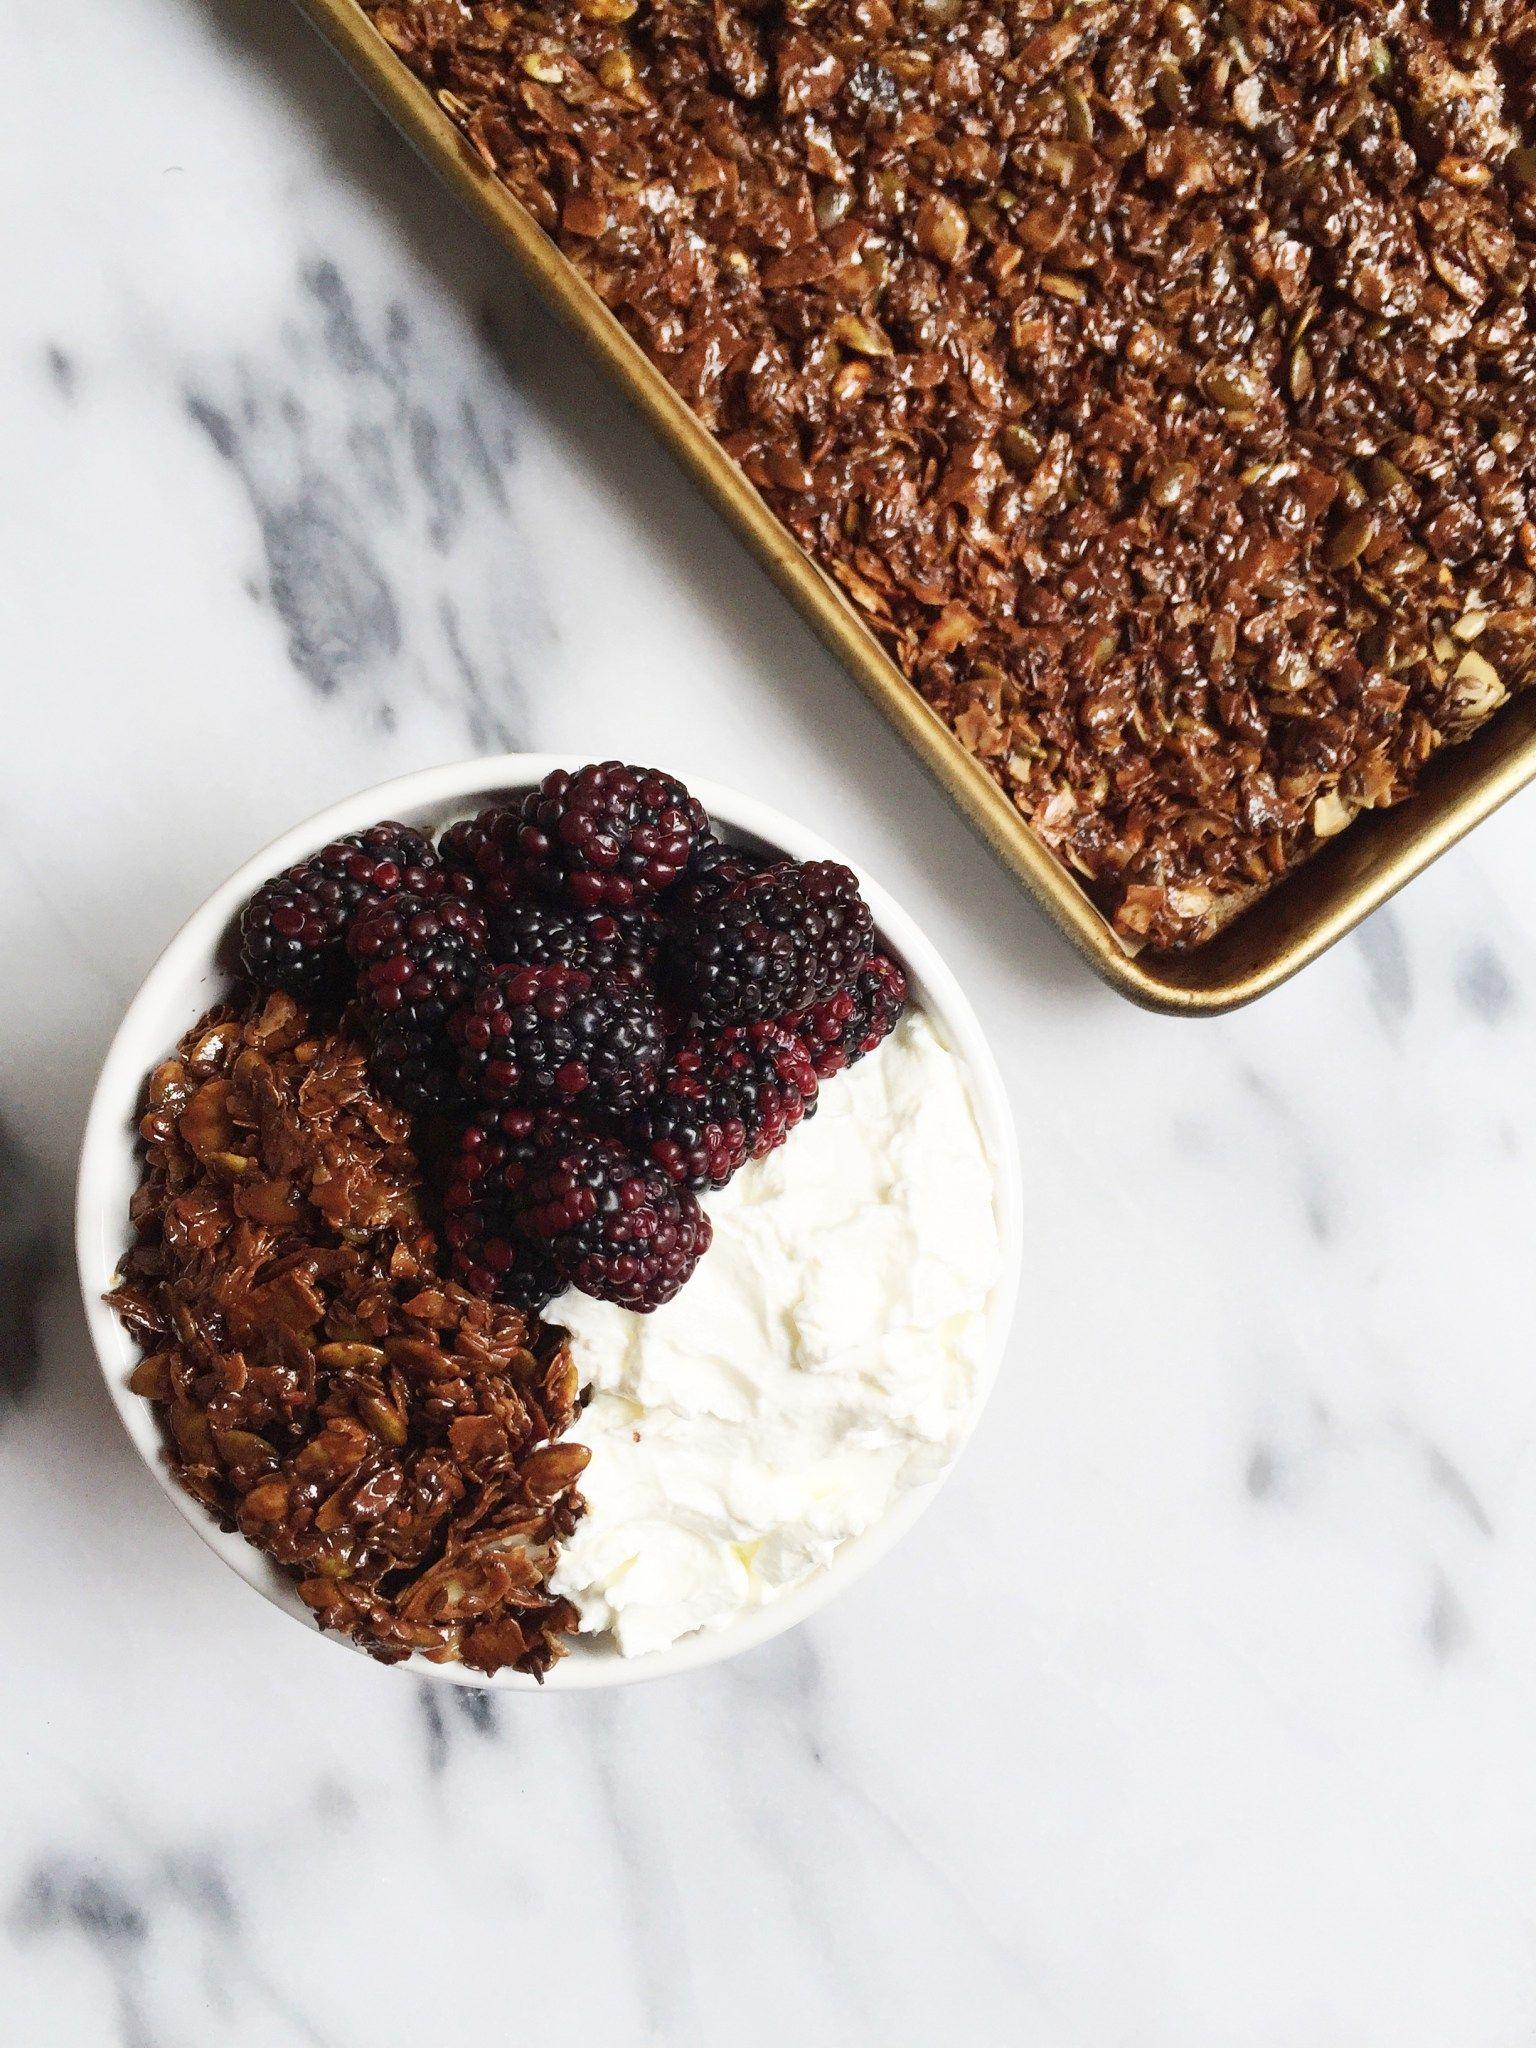 6ingredient chocolate granola nut grainfree